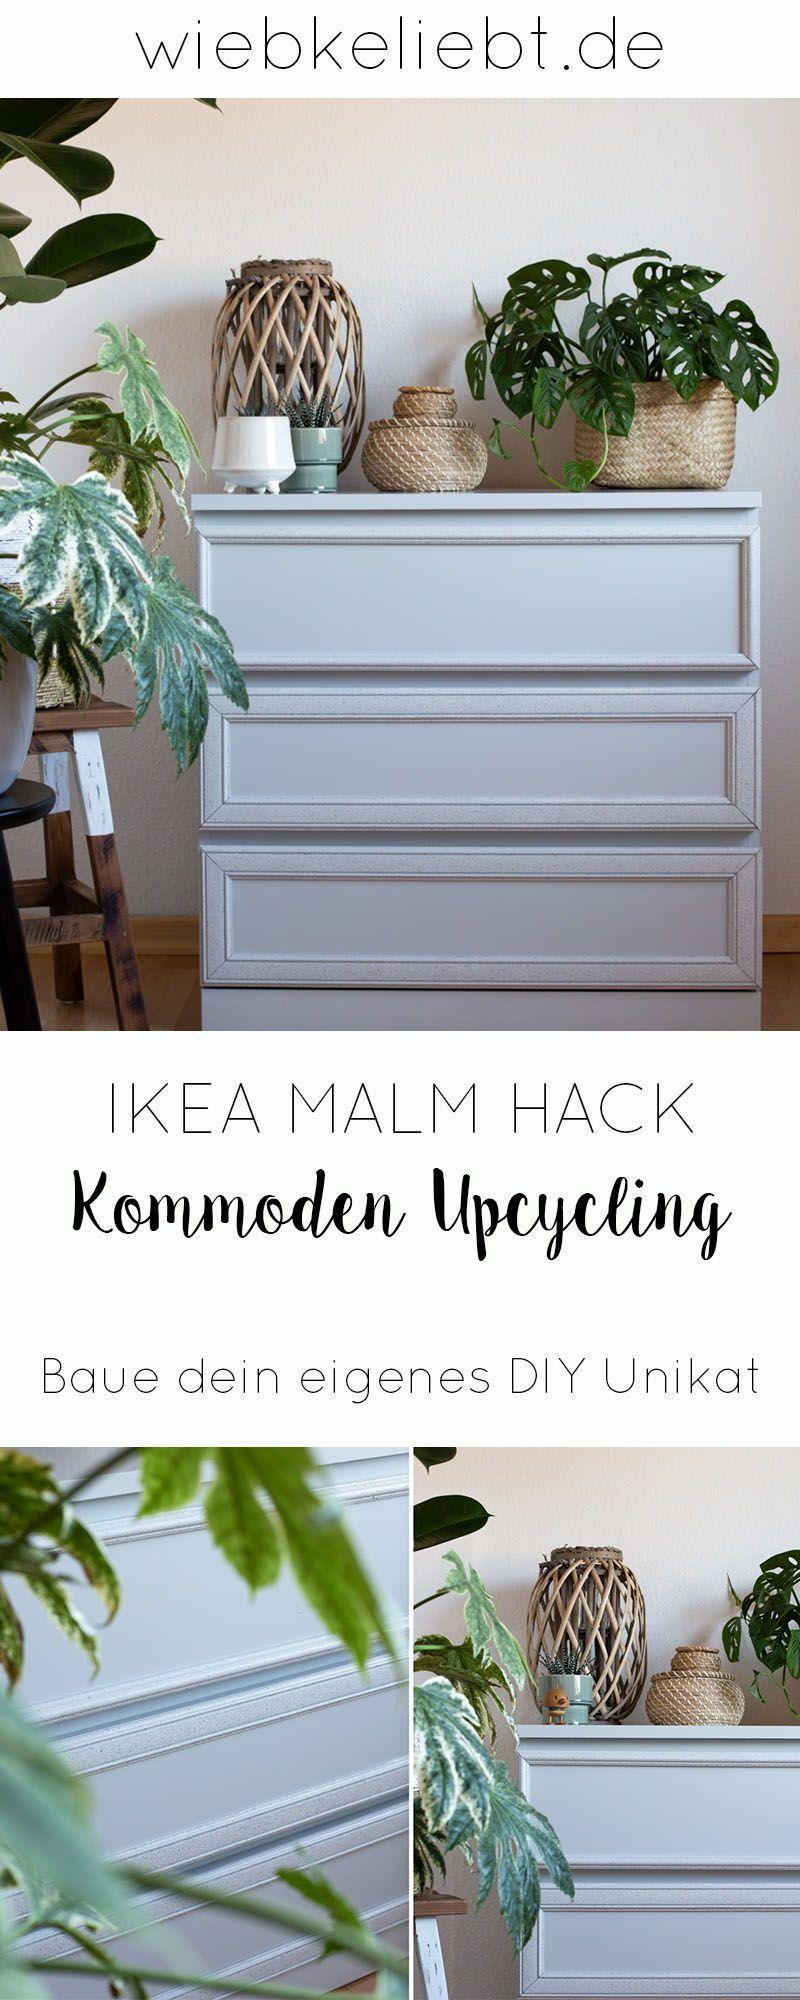 Alte Ikea Anleitungen